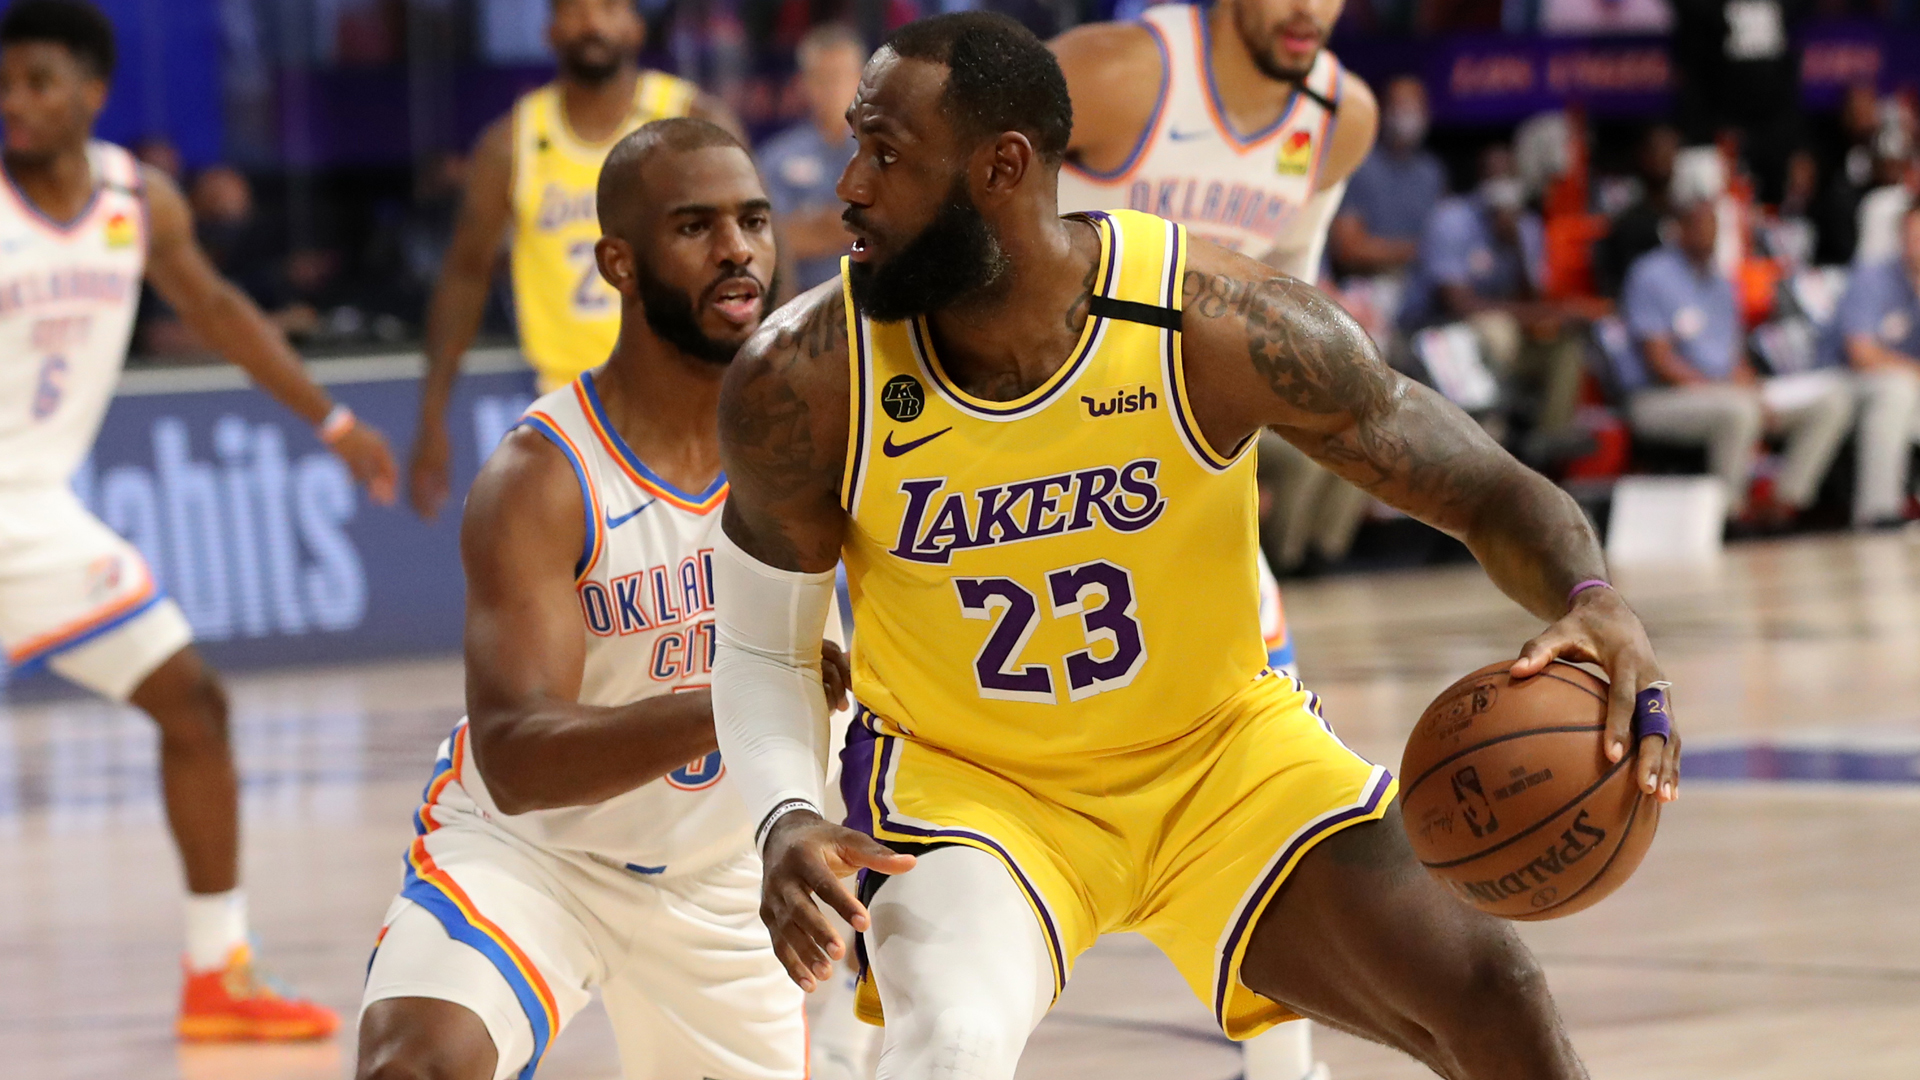 Thunder @ Lakers